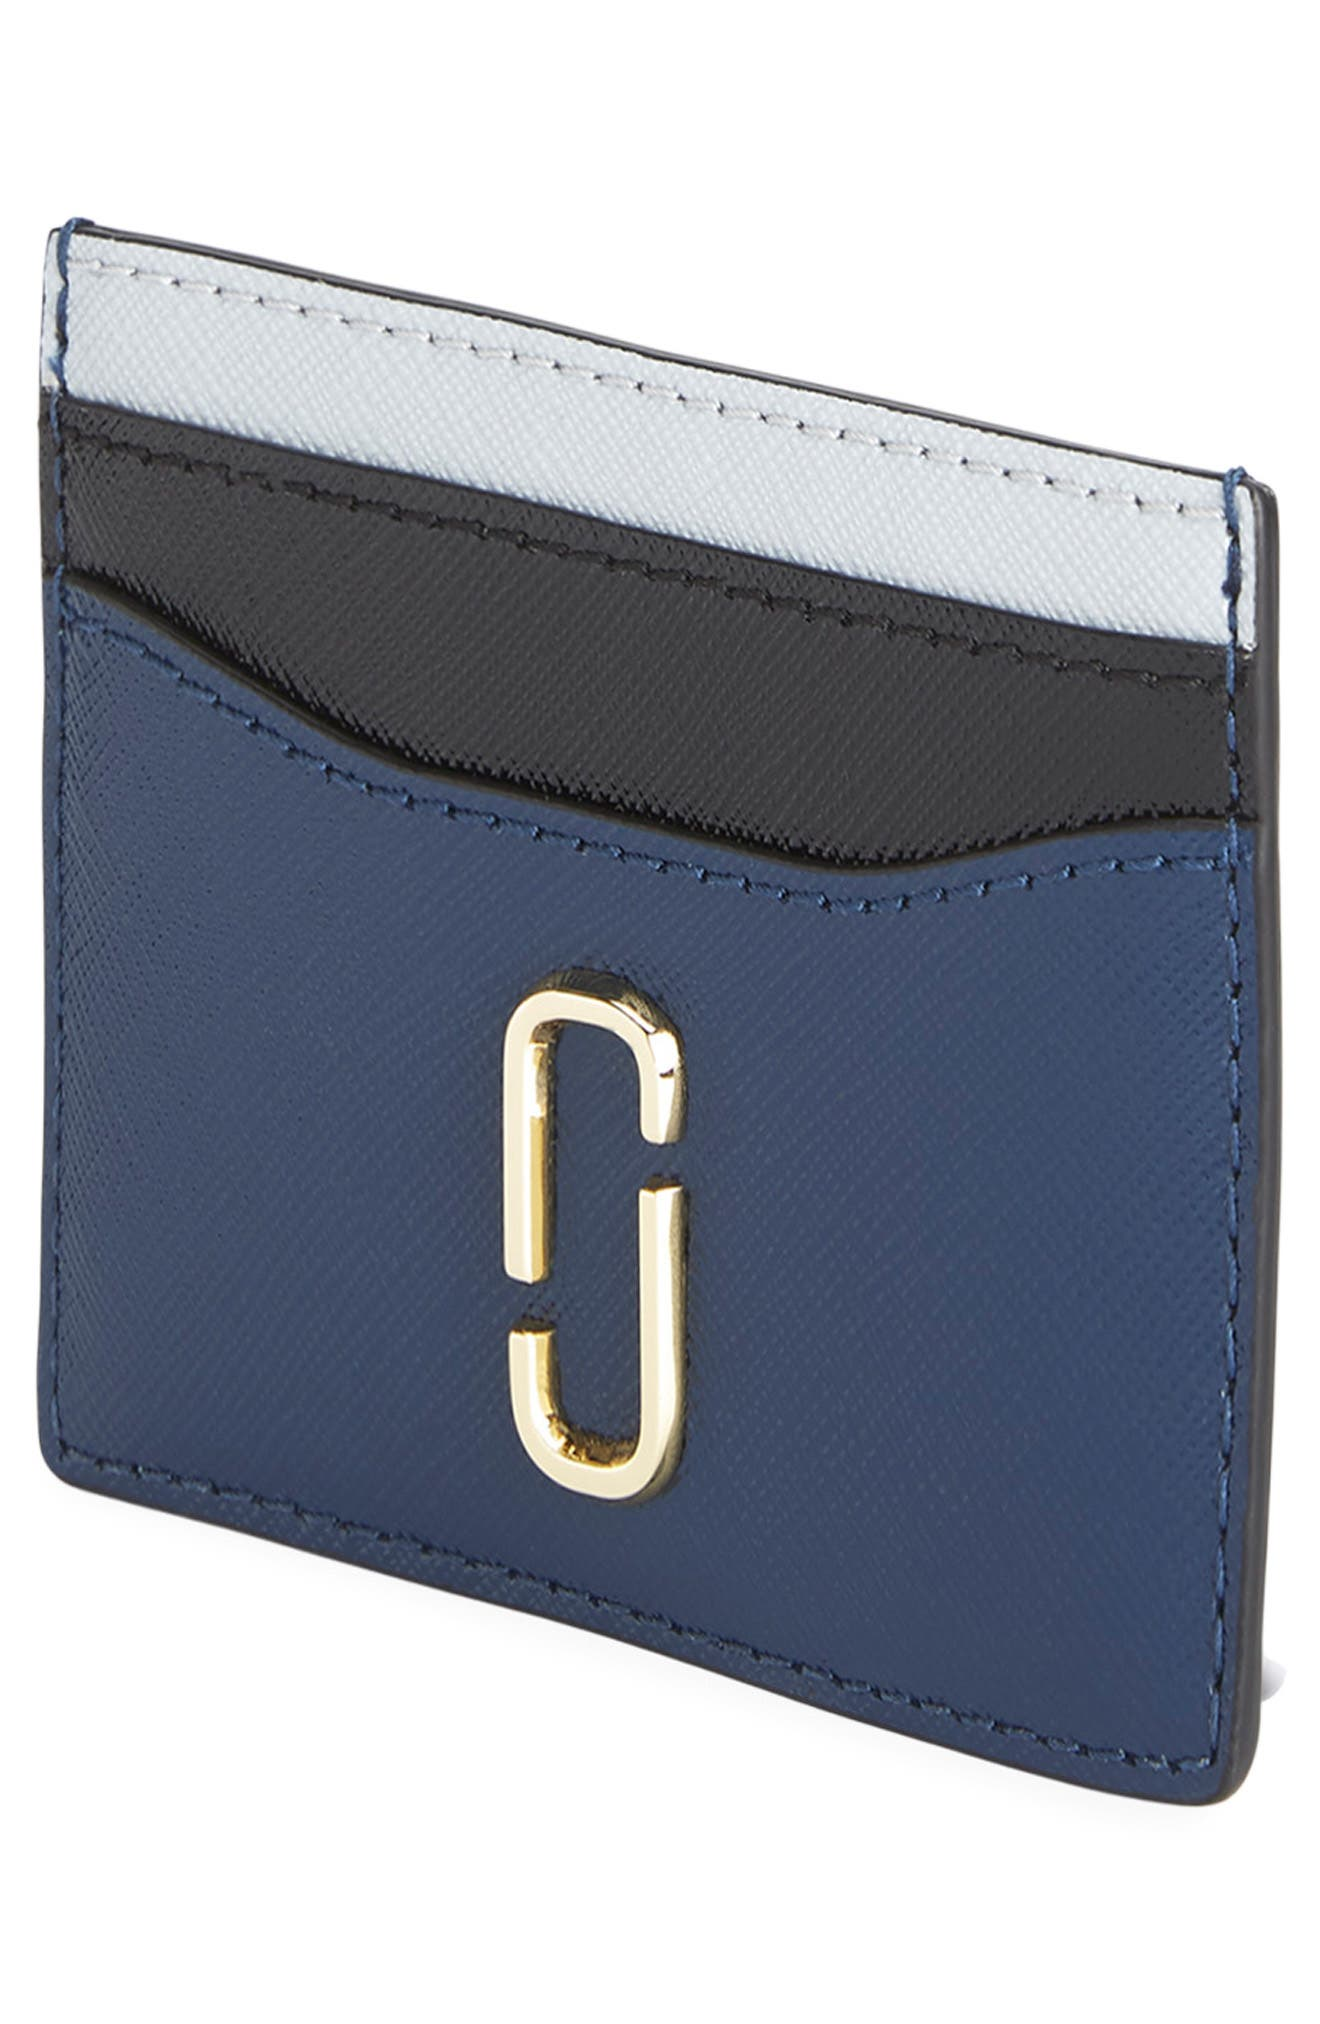 Snapshot Saffiano Leather Card Case,                             Alternate thumbnail 3, color,                             BLUE SEA MULTI